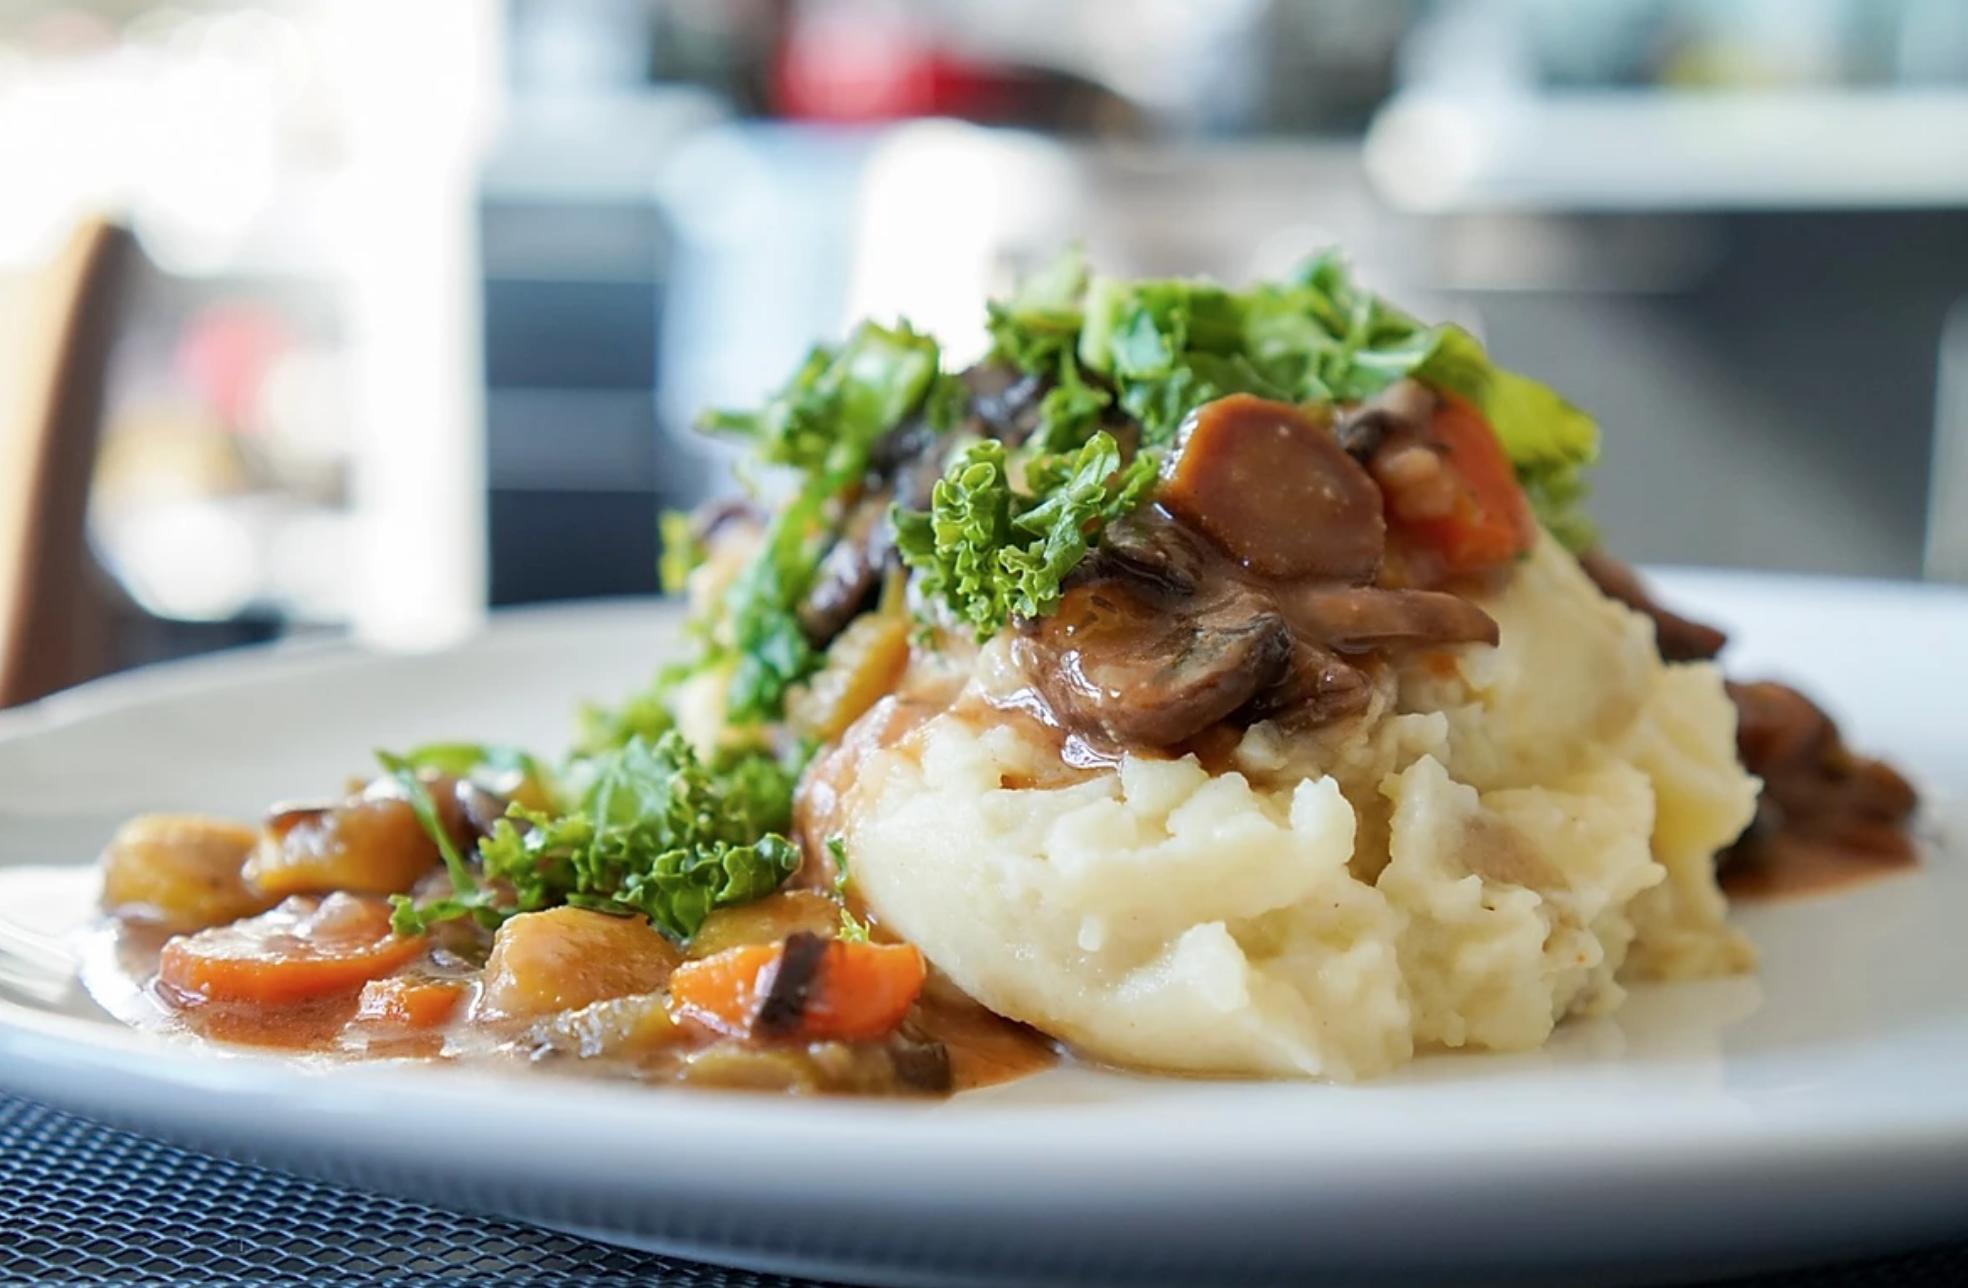 Mushroom Bourguignon with Vegan Mashed Potatoes